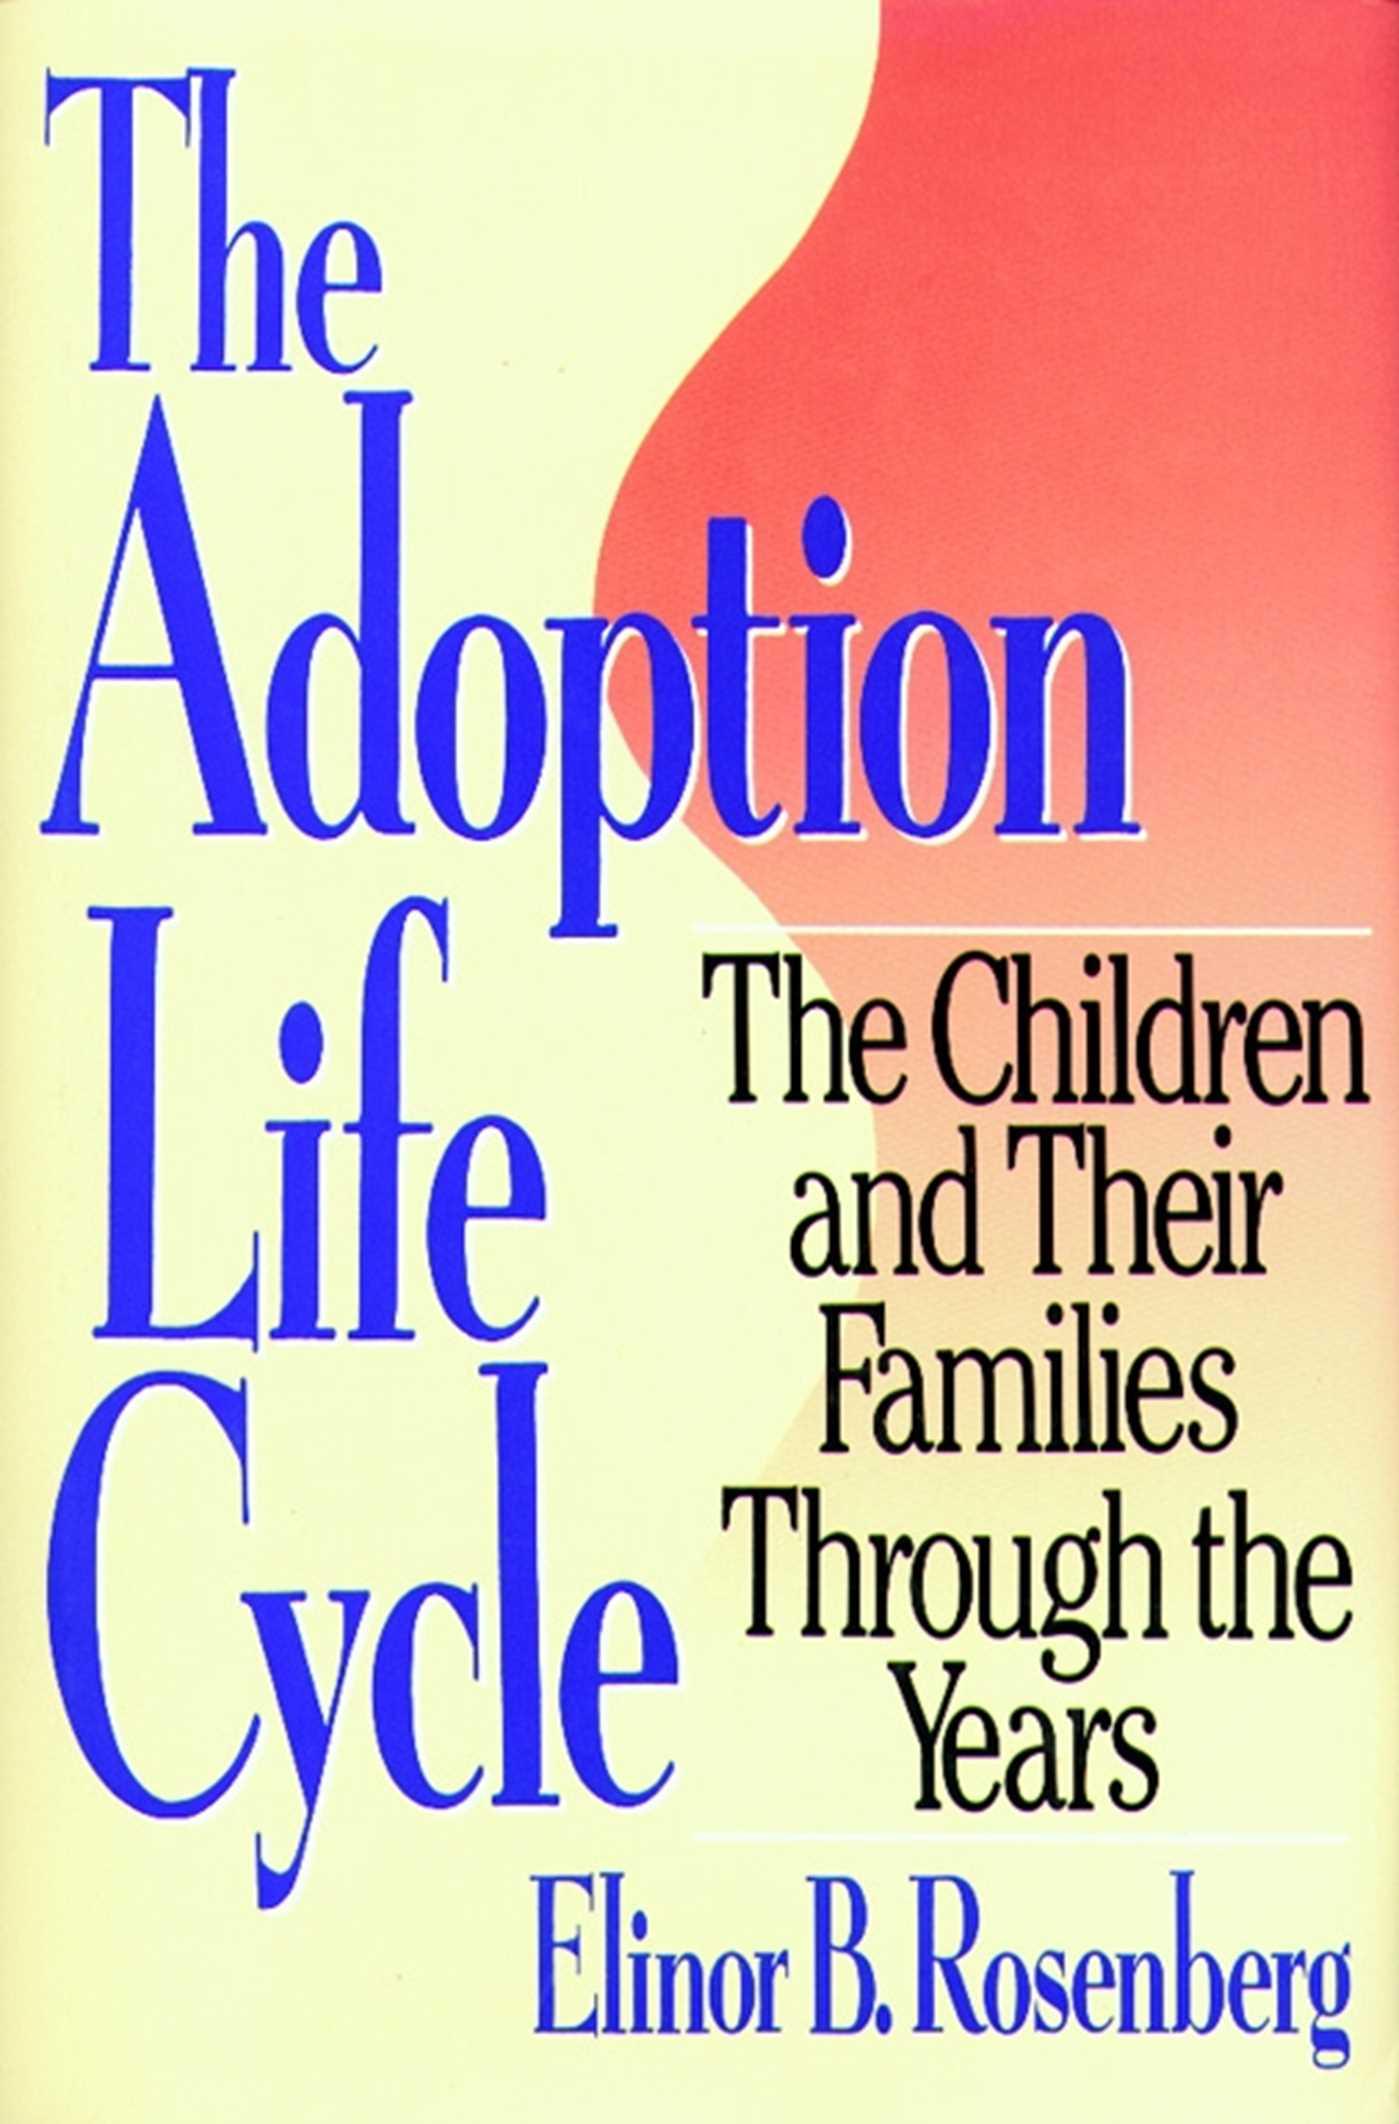 Adoption life cycle 9781451602487 hr